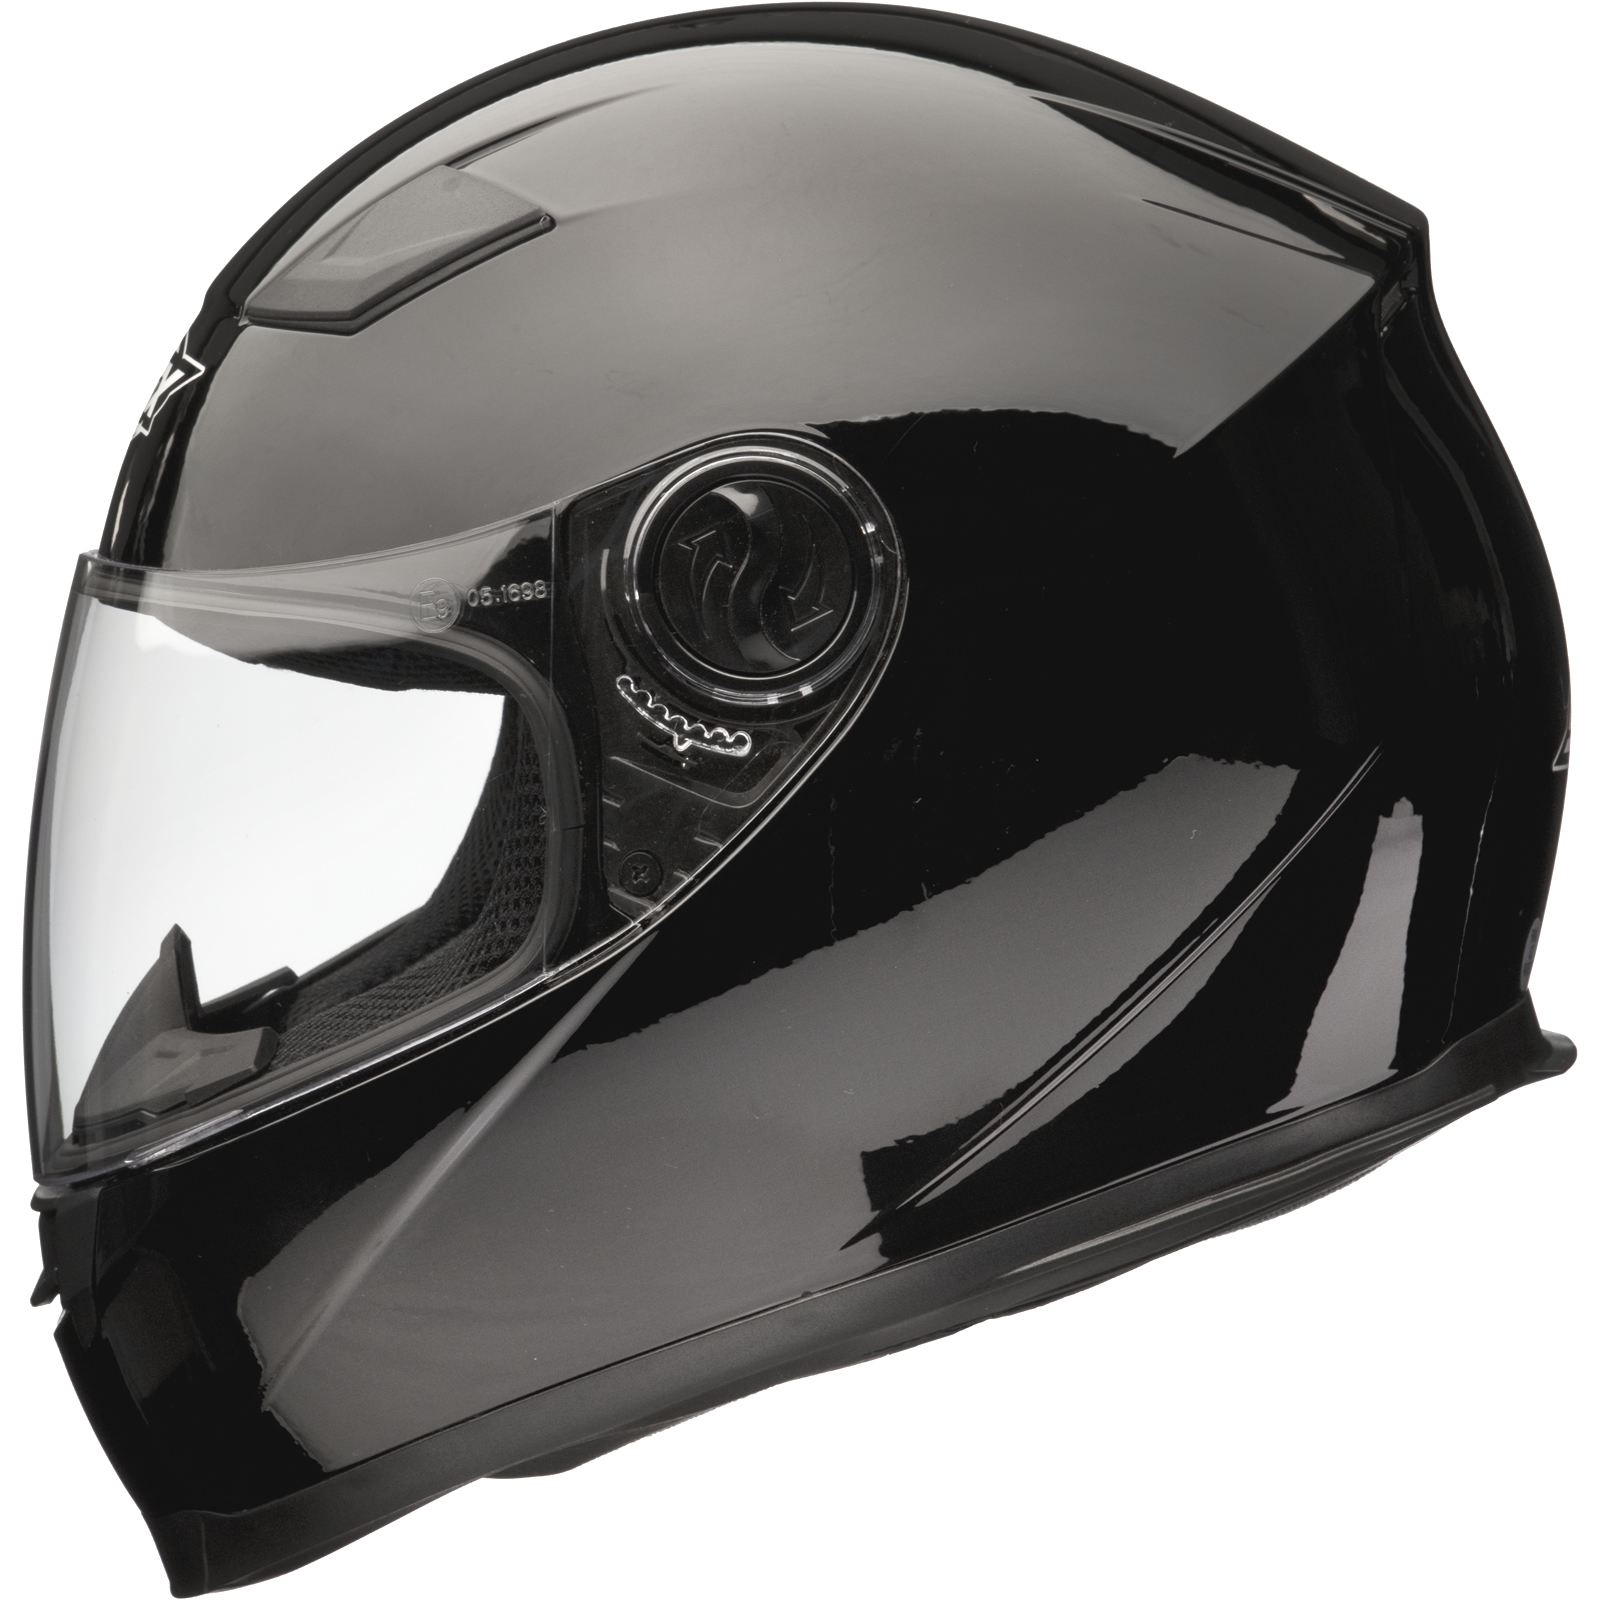 Suzuki Hayabusa Motorcycle Helmets